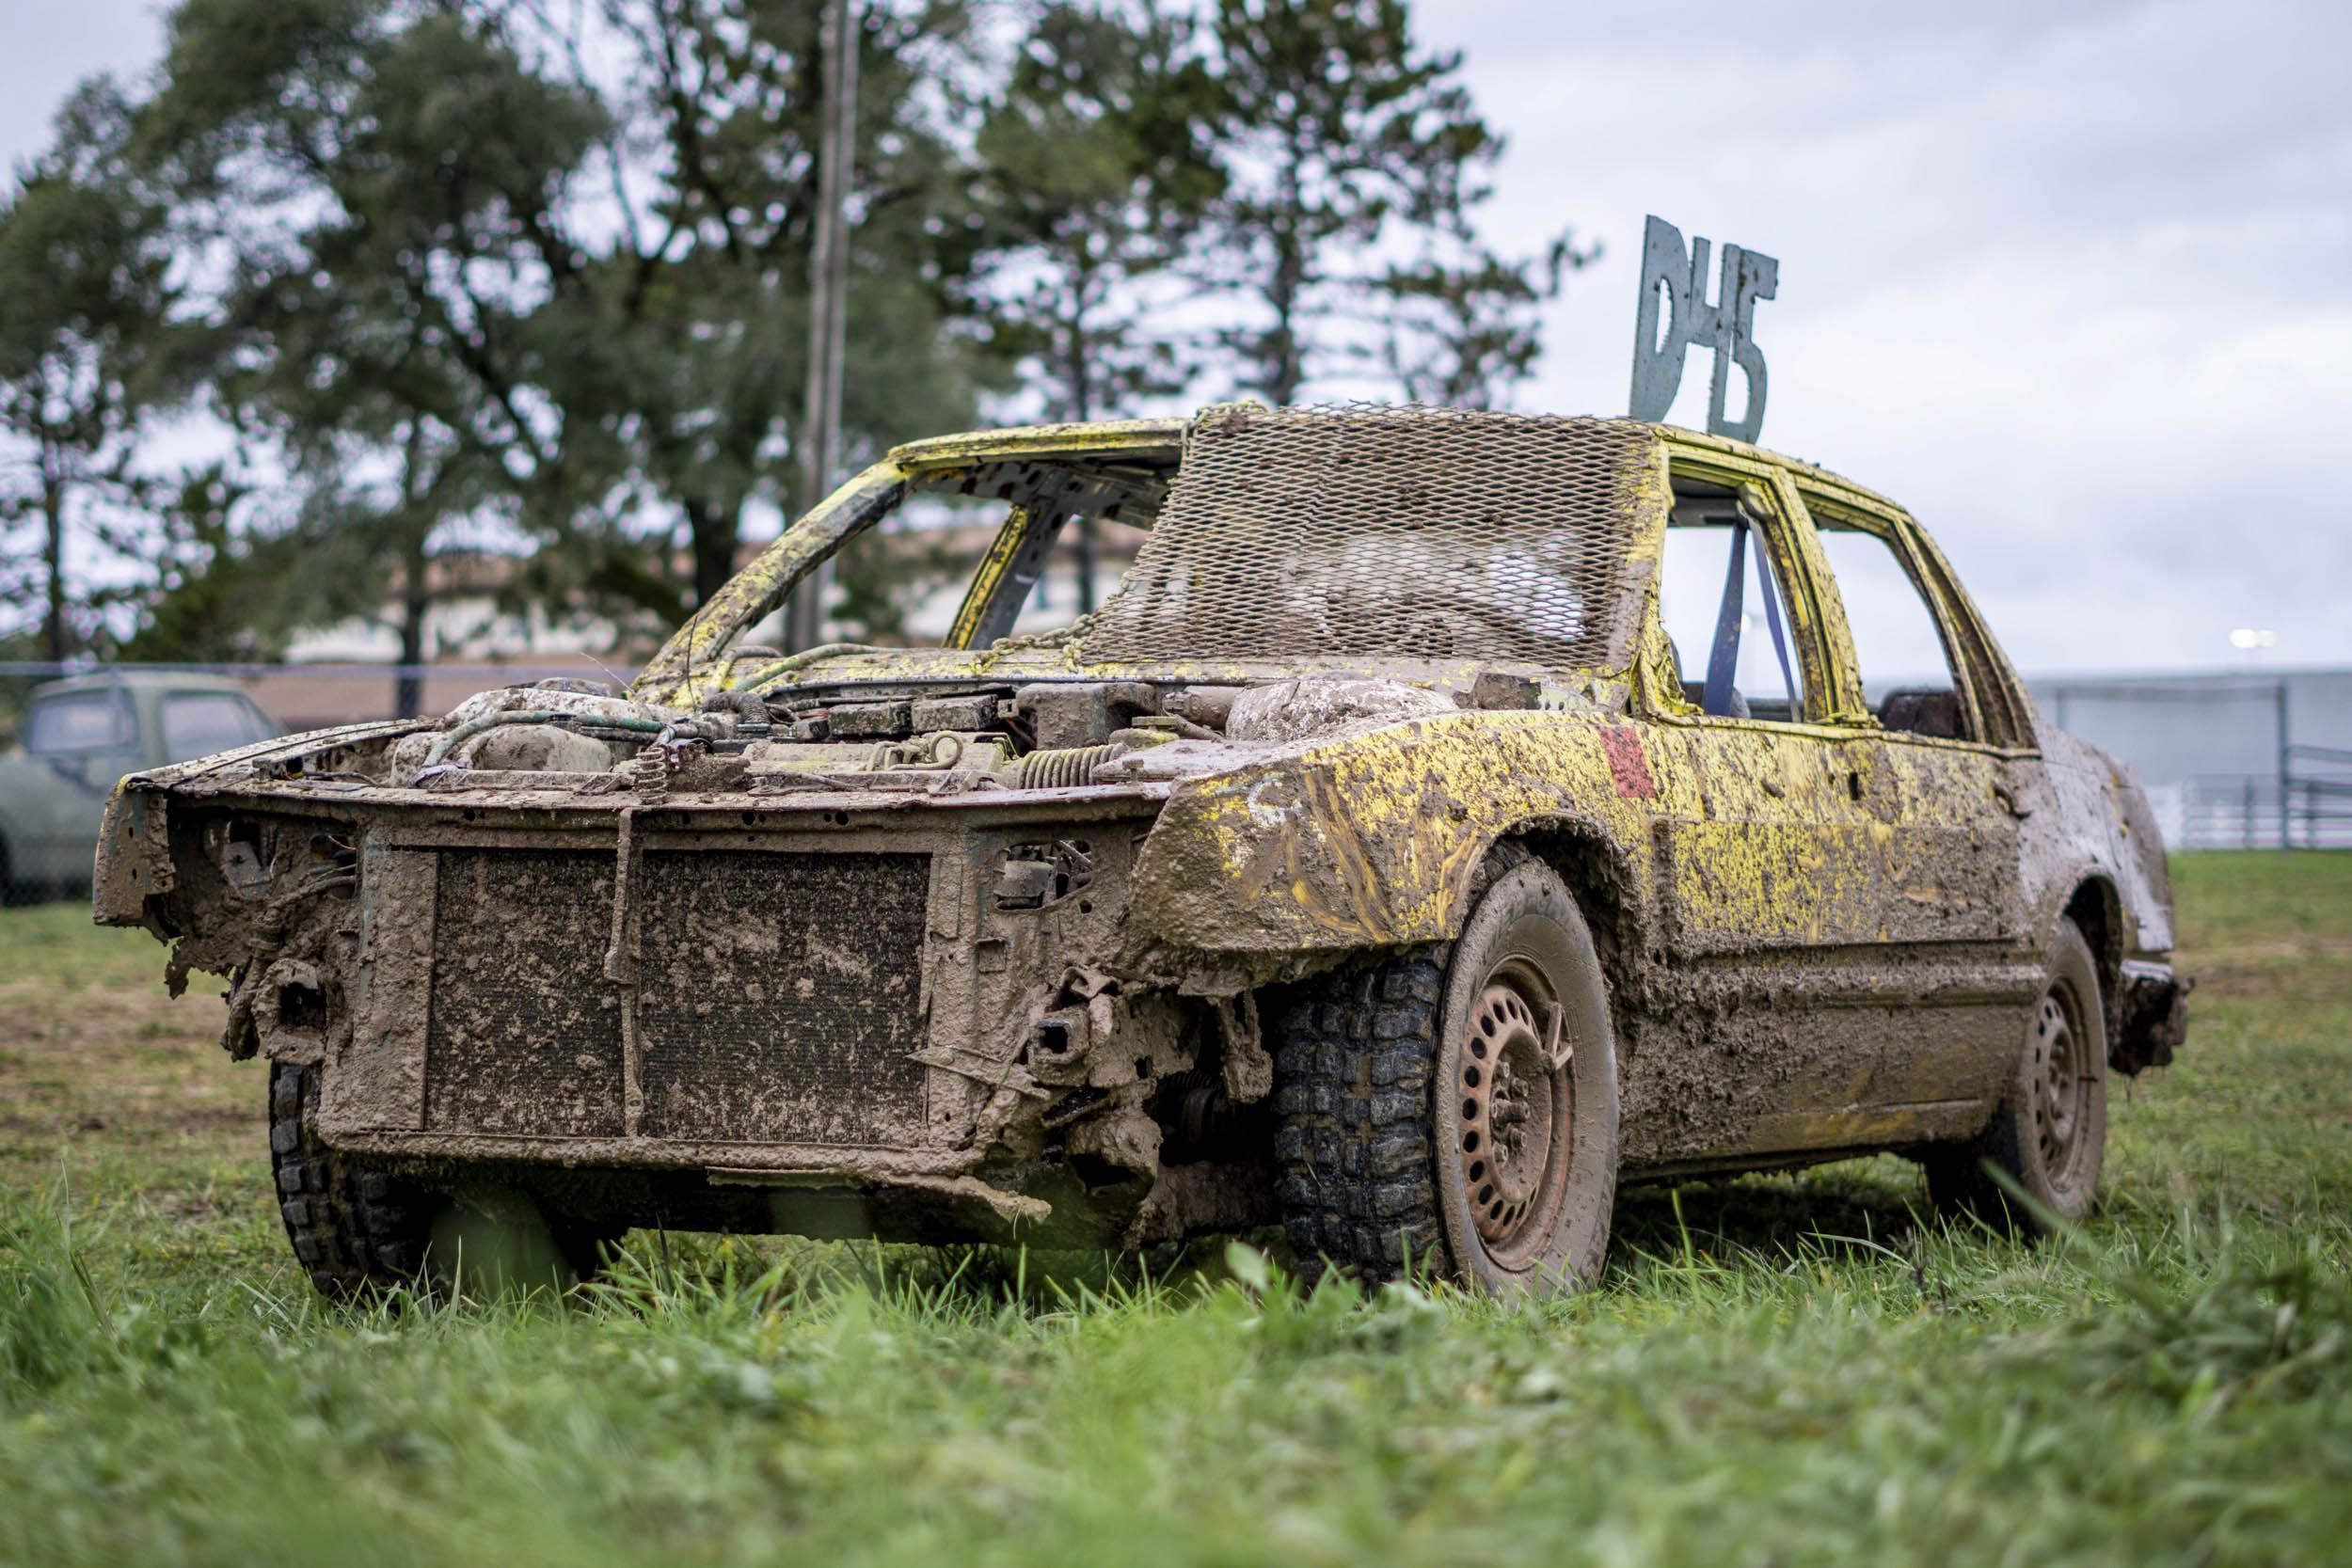 mud covered demolition derby car